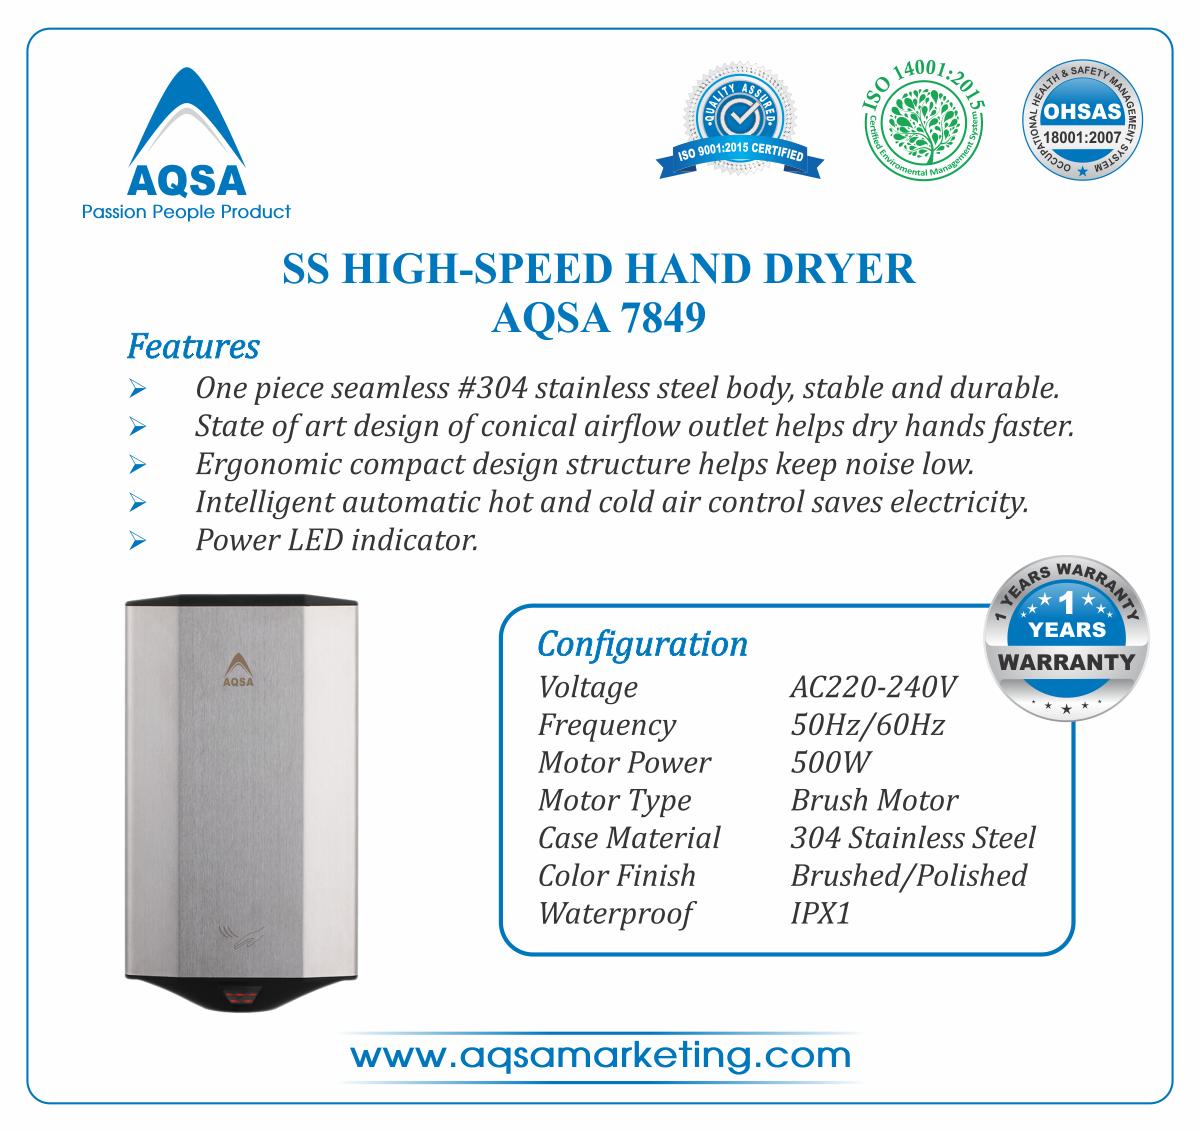 SS High-Speed Hand Dryer AQSA-7849 image